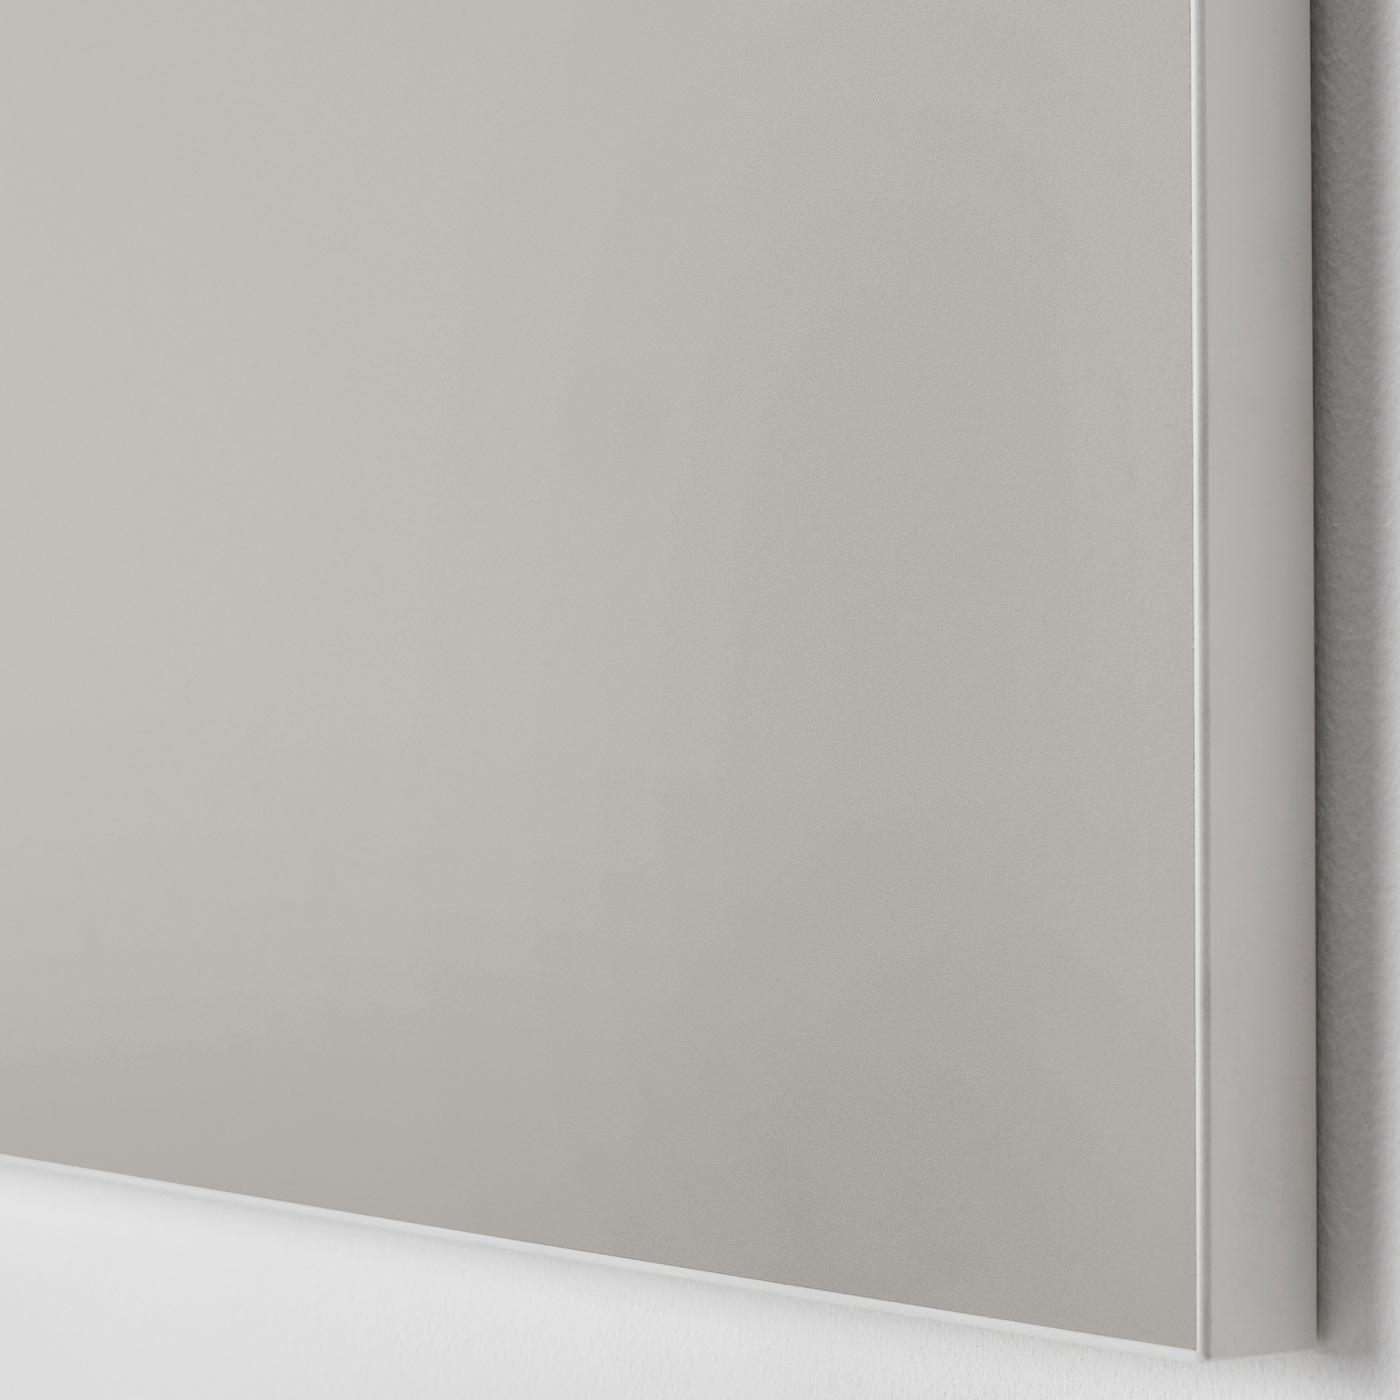 SKATVAL Deur, lichtgrijs, 60x60 cm